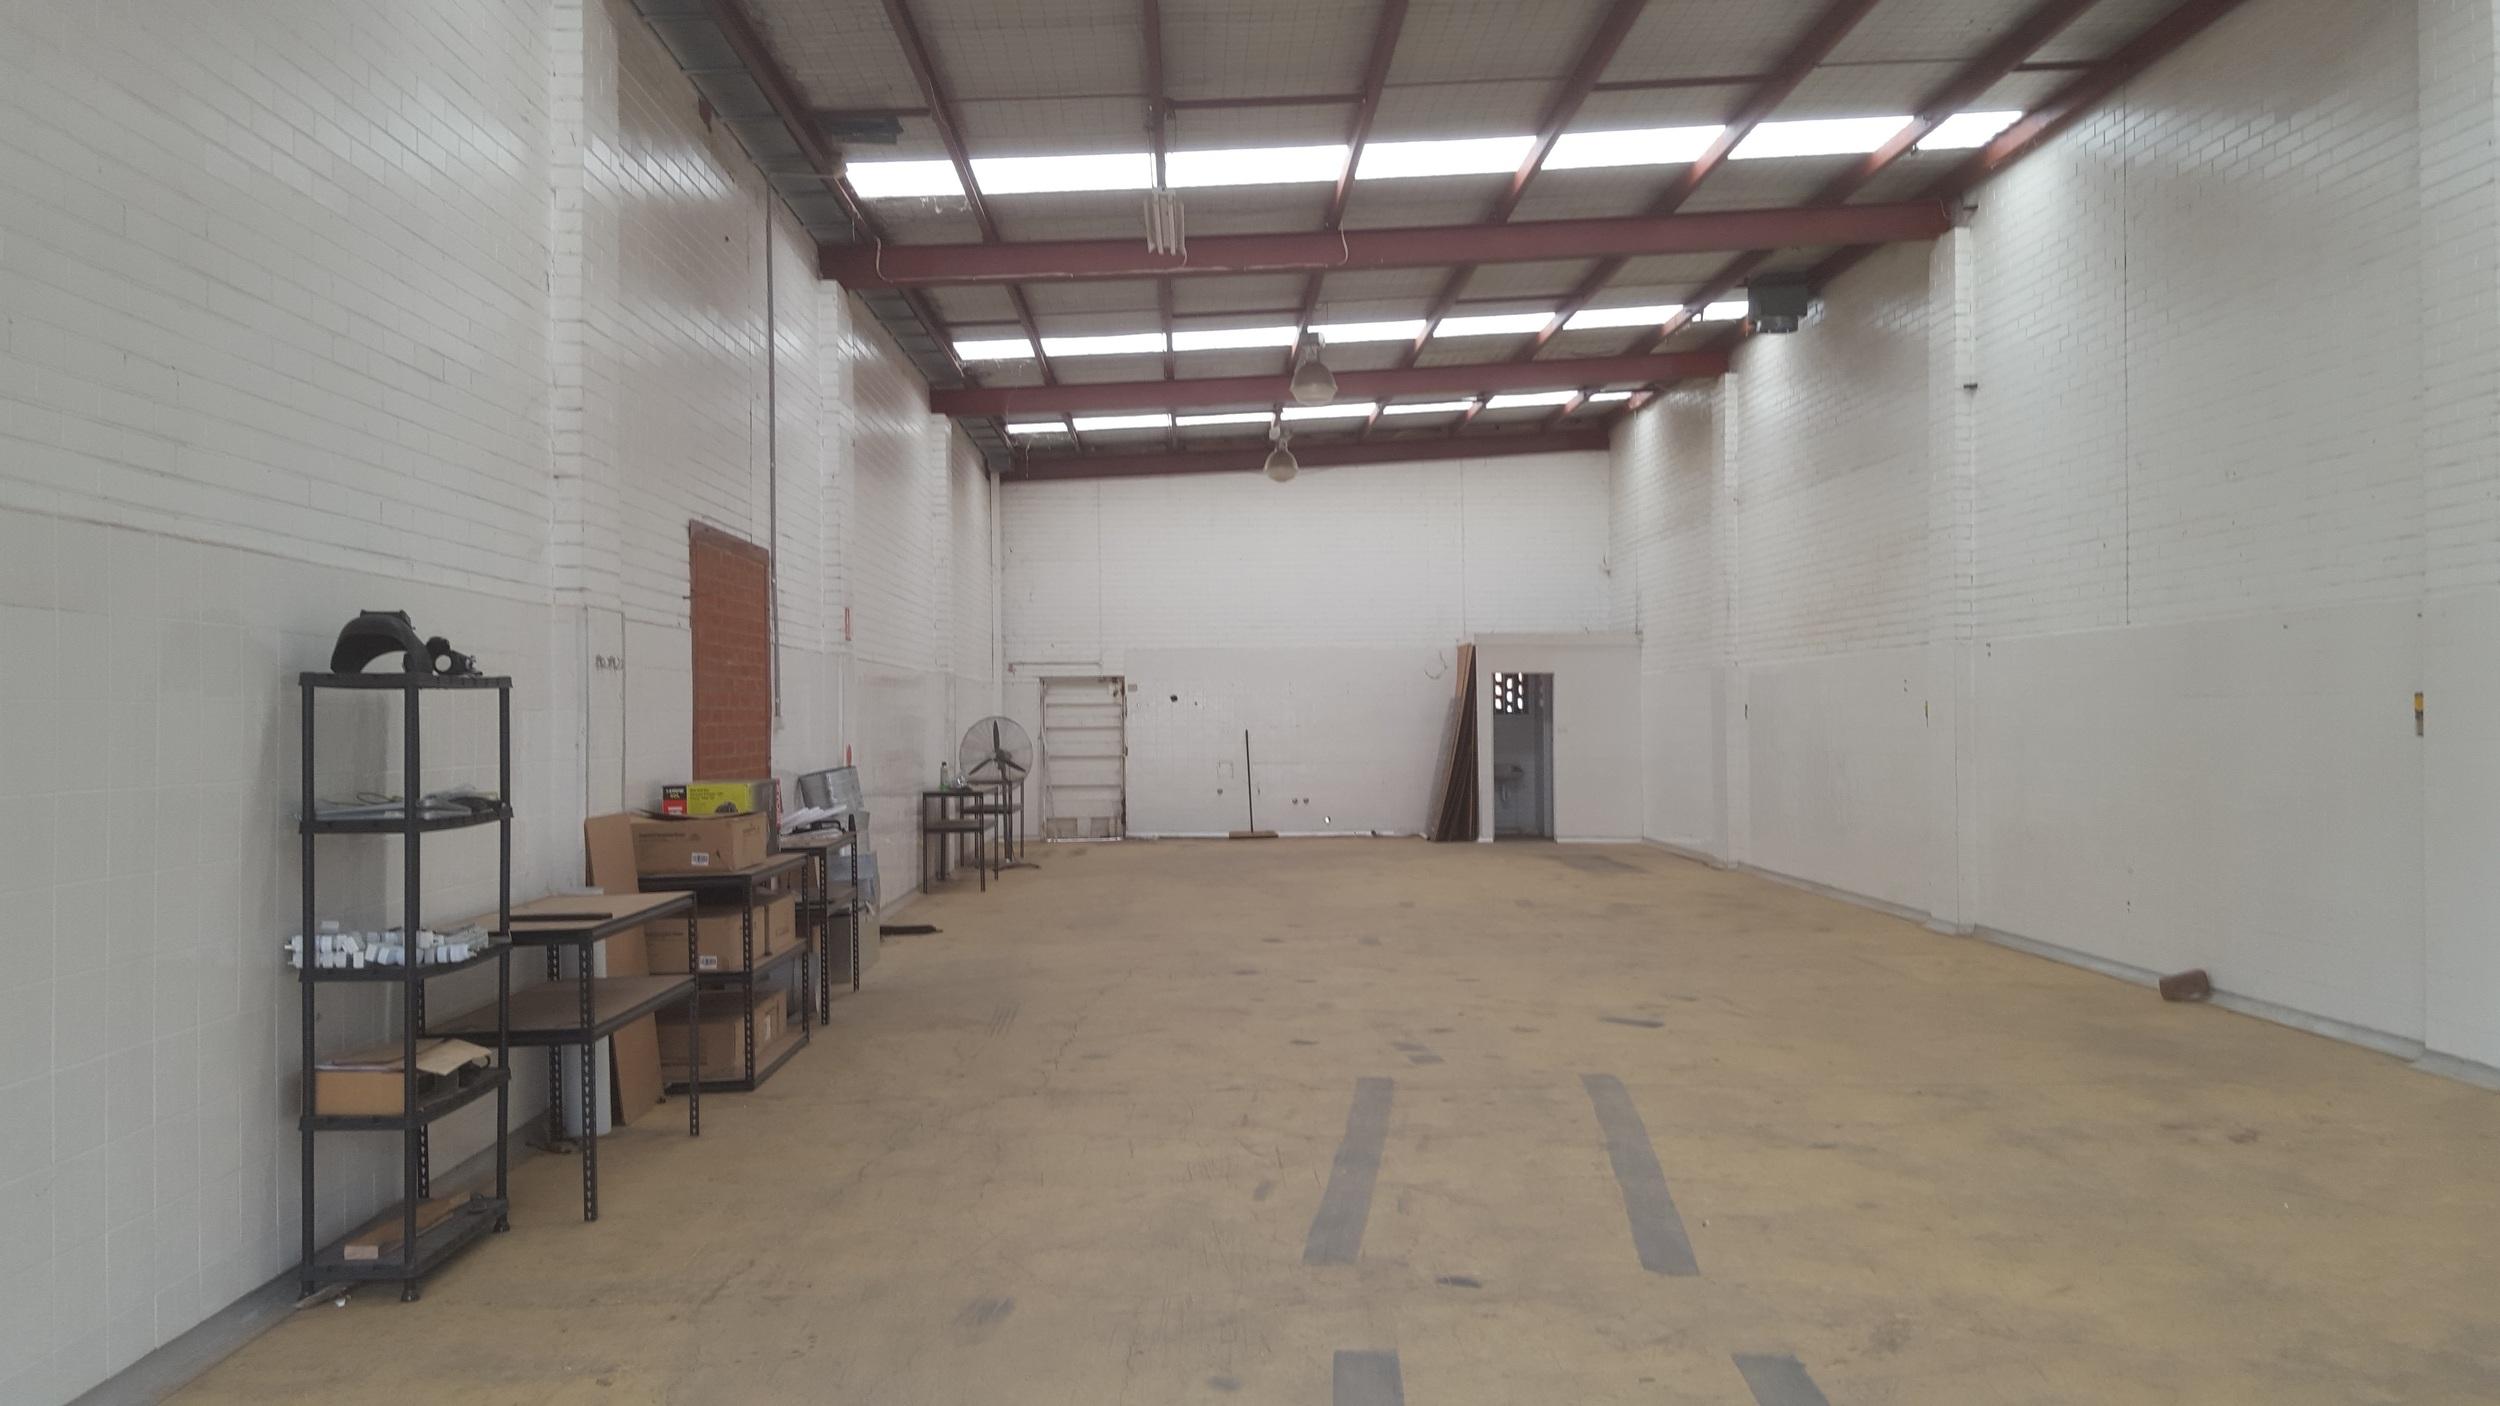 Passage of Flick Warehouse Empty